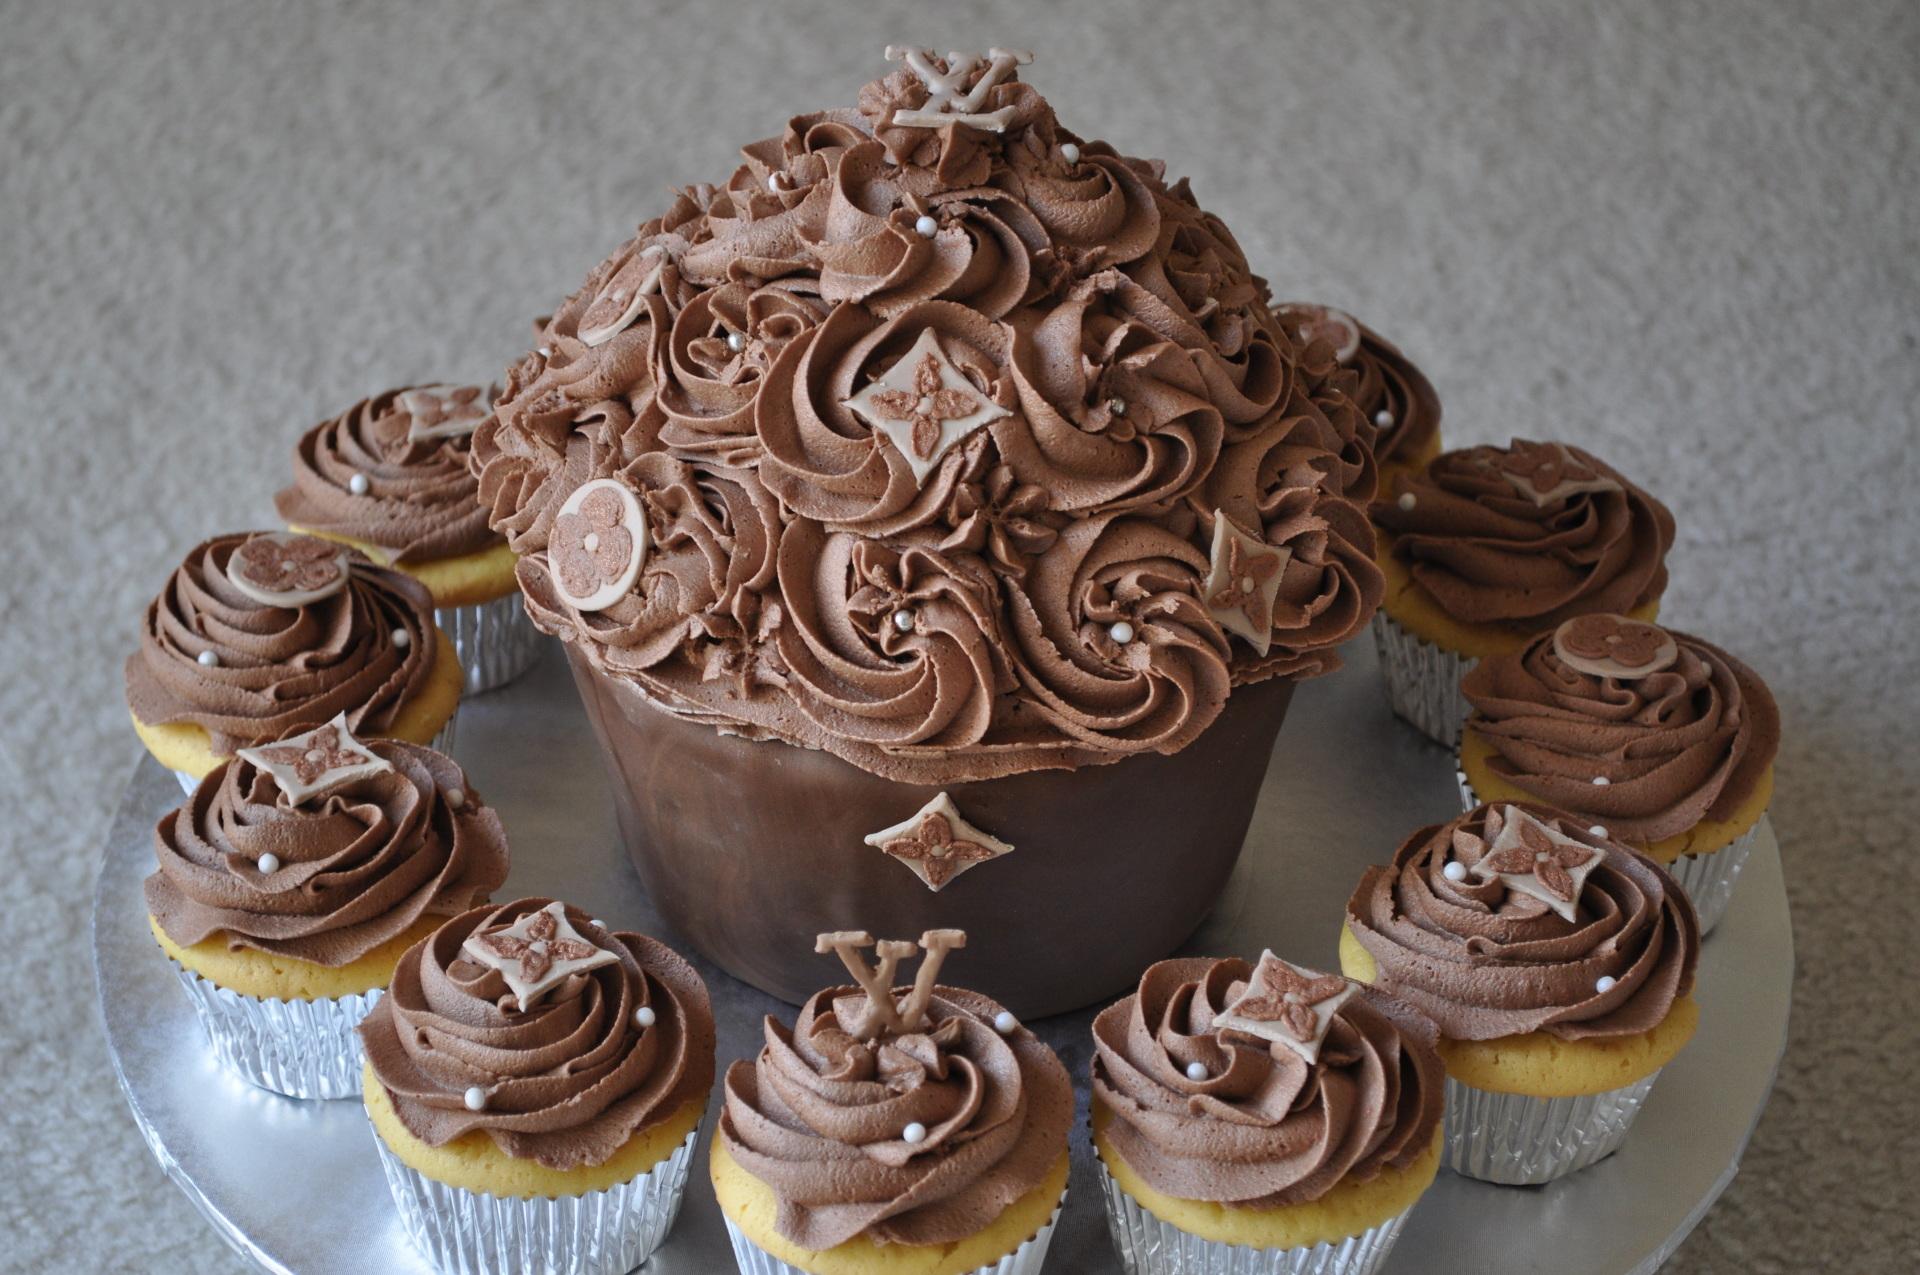 LV jumbo cupcake and cupcakes, bridal shower cake